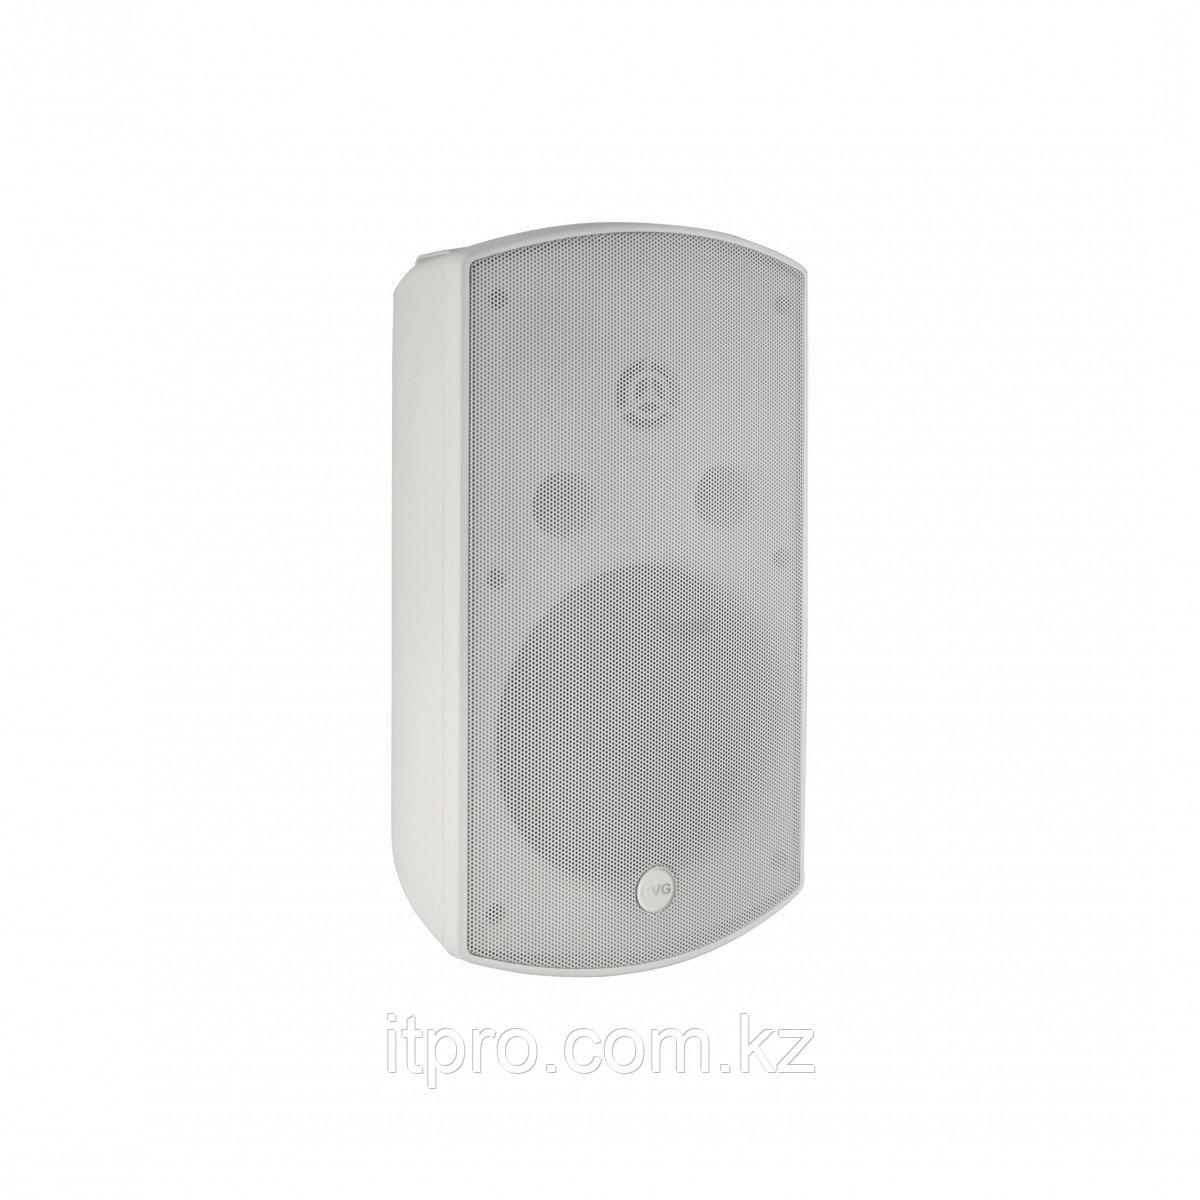 Настенный громкоговоритель CVGaudio RF616TW, 50W(100V) /100W(16 Ohm)